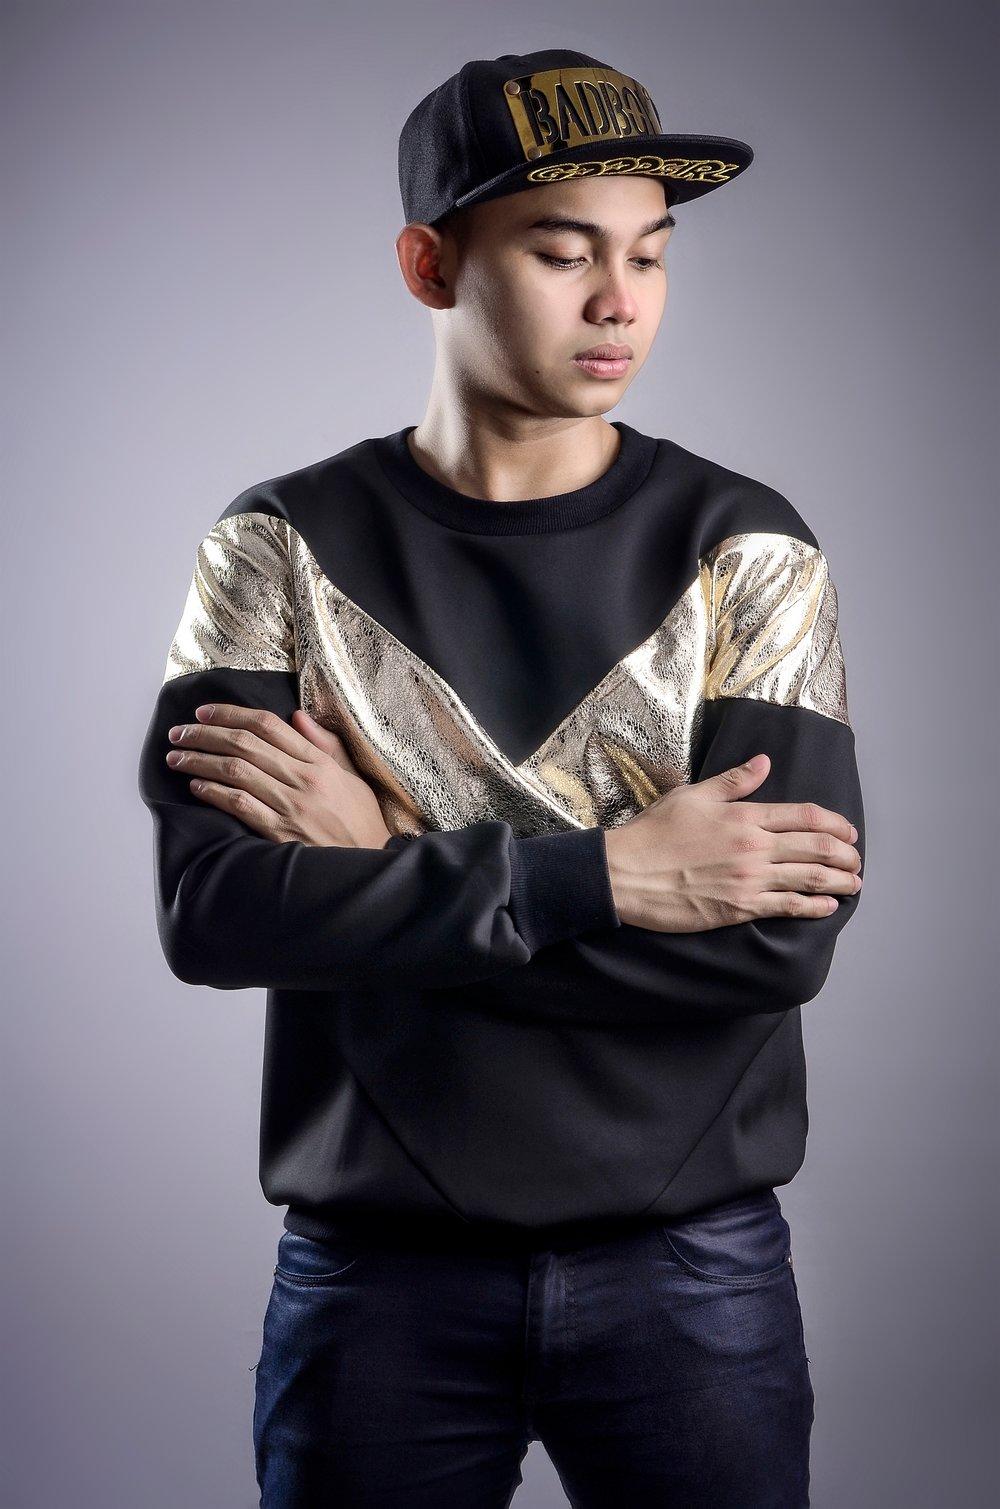 IJAS BEATJUNK Resident DJ @ Barcode, Makassar